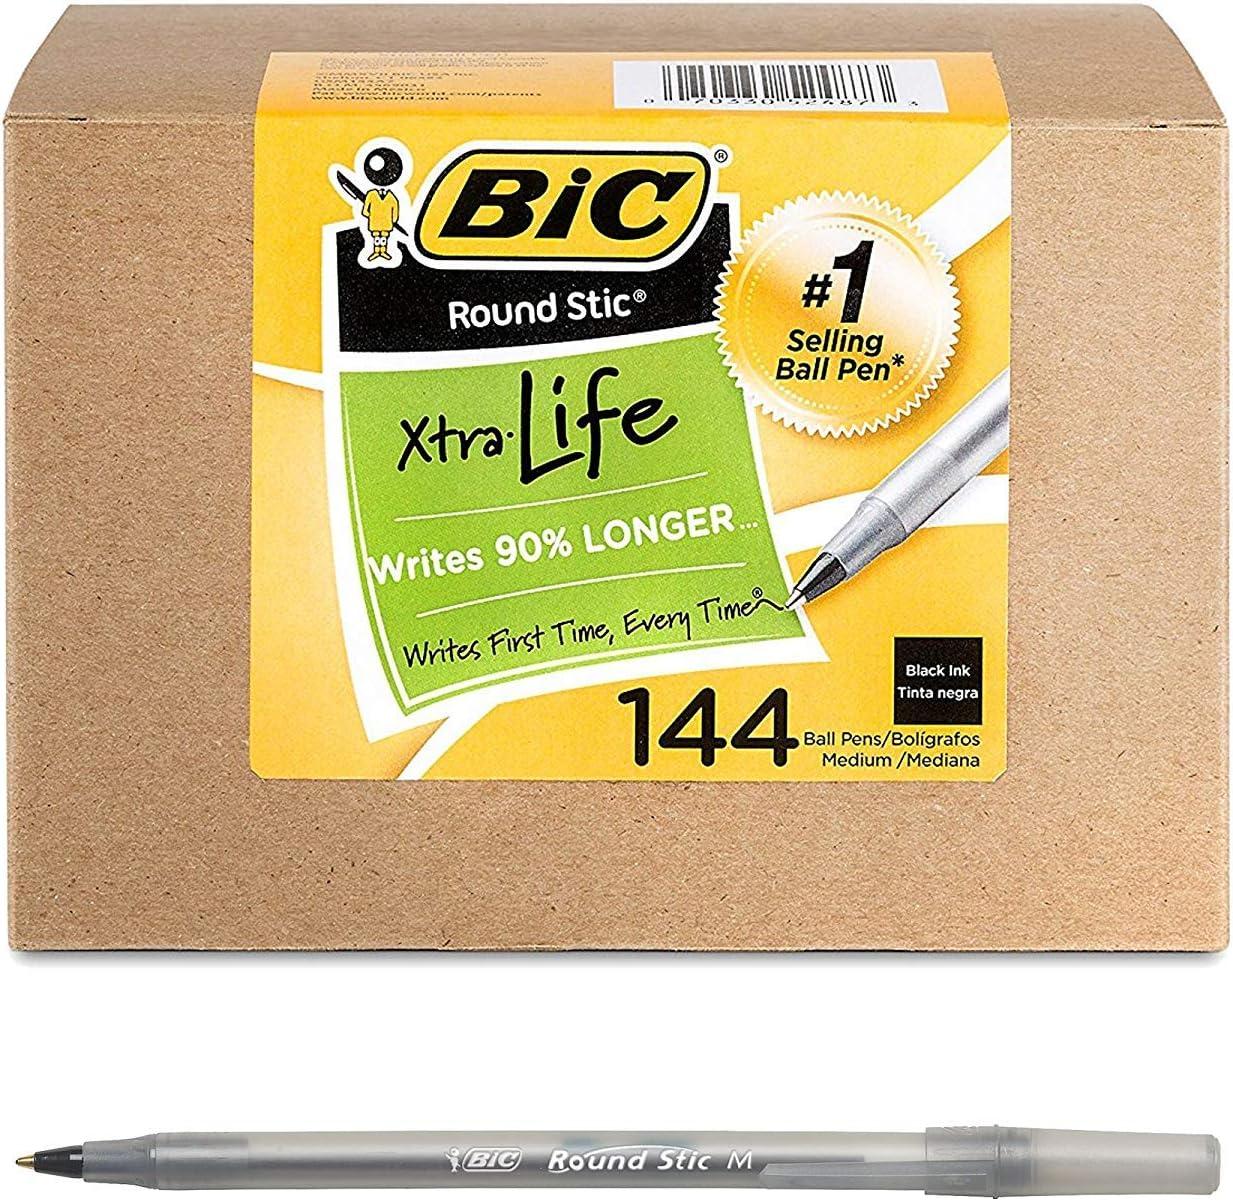 Black BIC Round Stic Xtra Life Ballpoint Pen 1.0mm 144 Count Medium Point